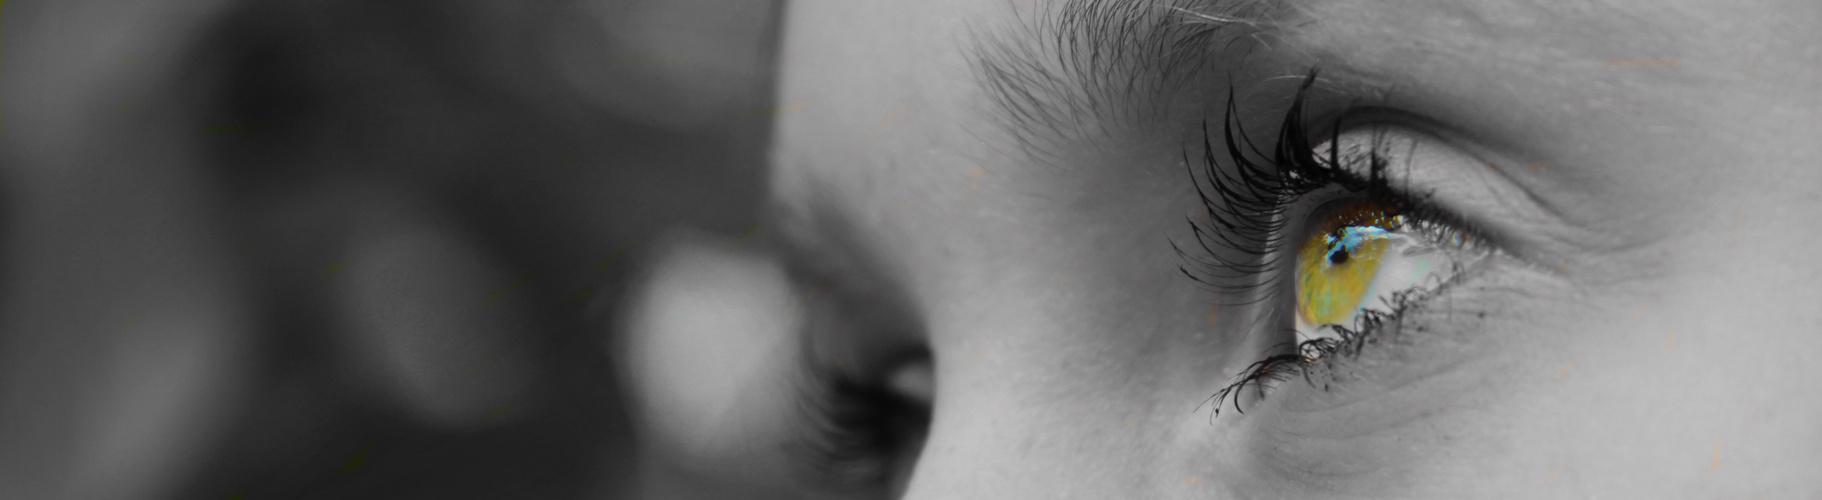 Farbriges Auge